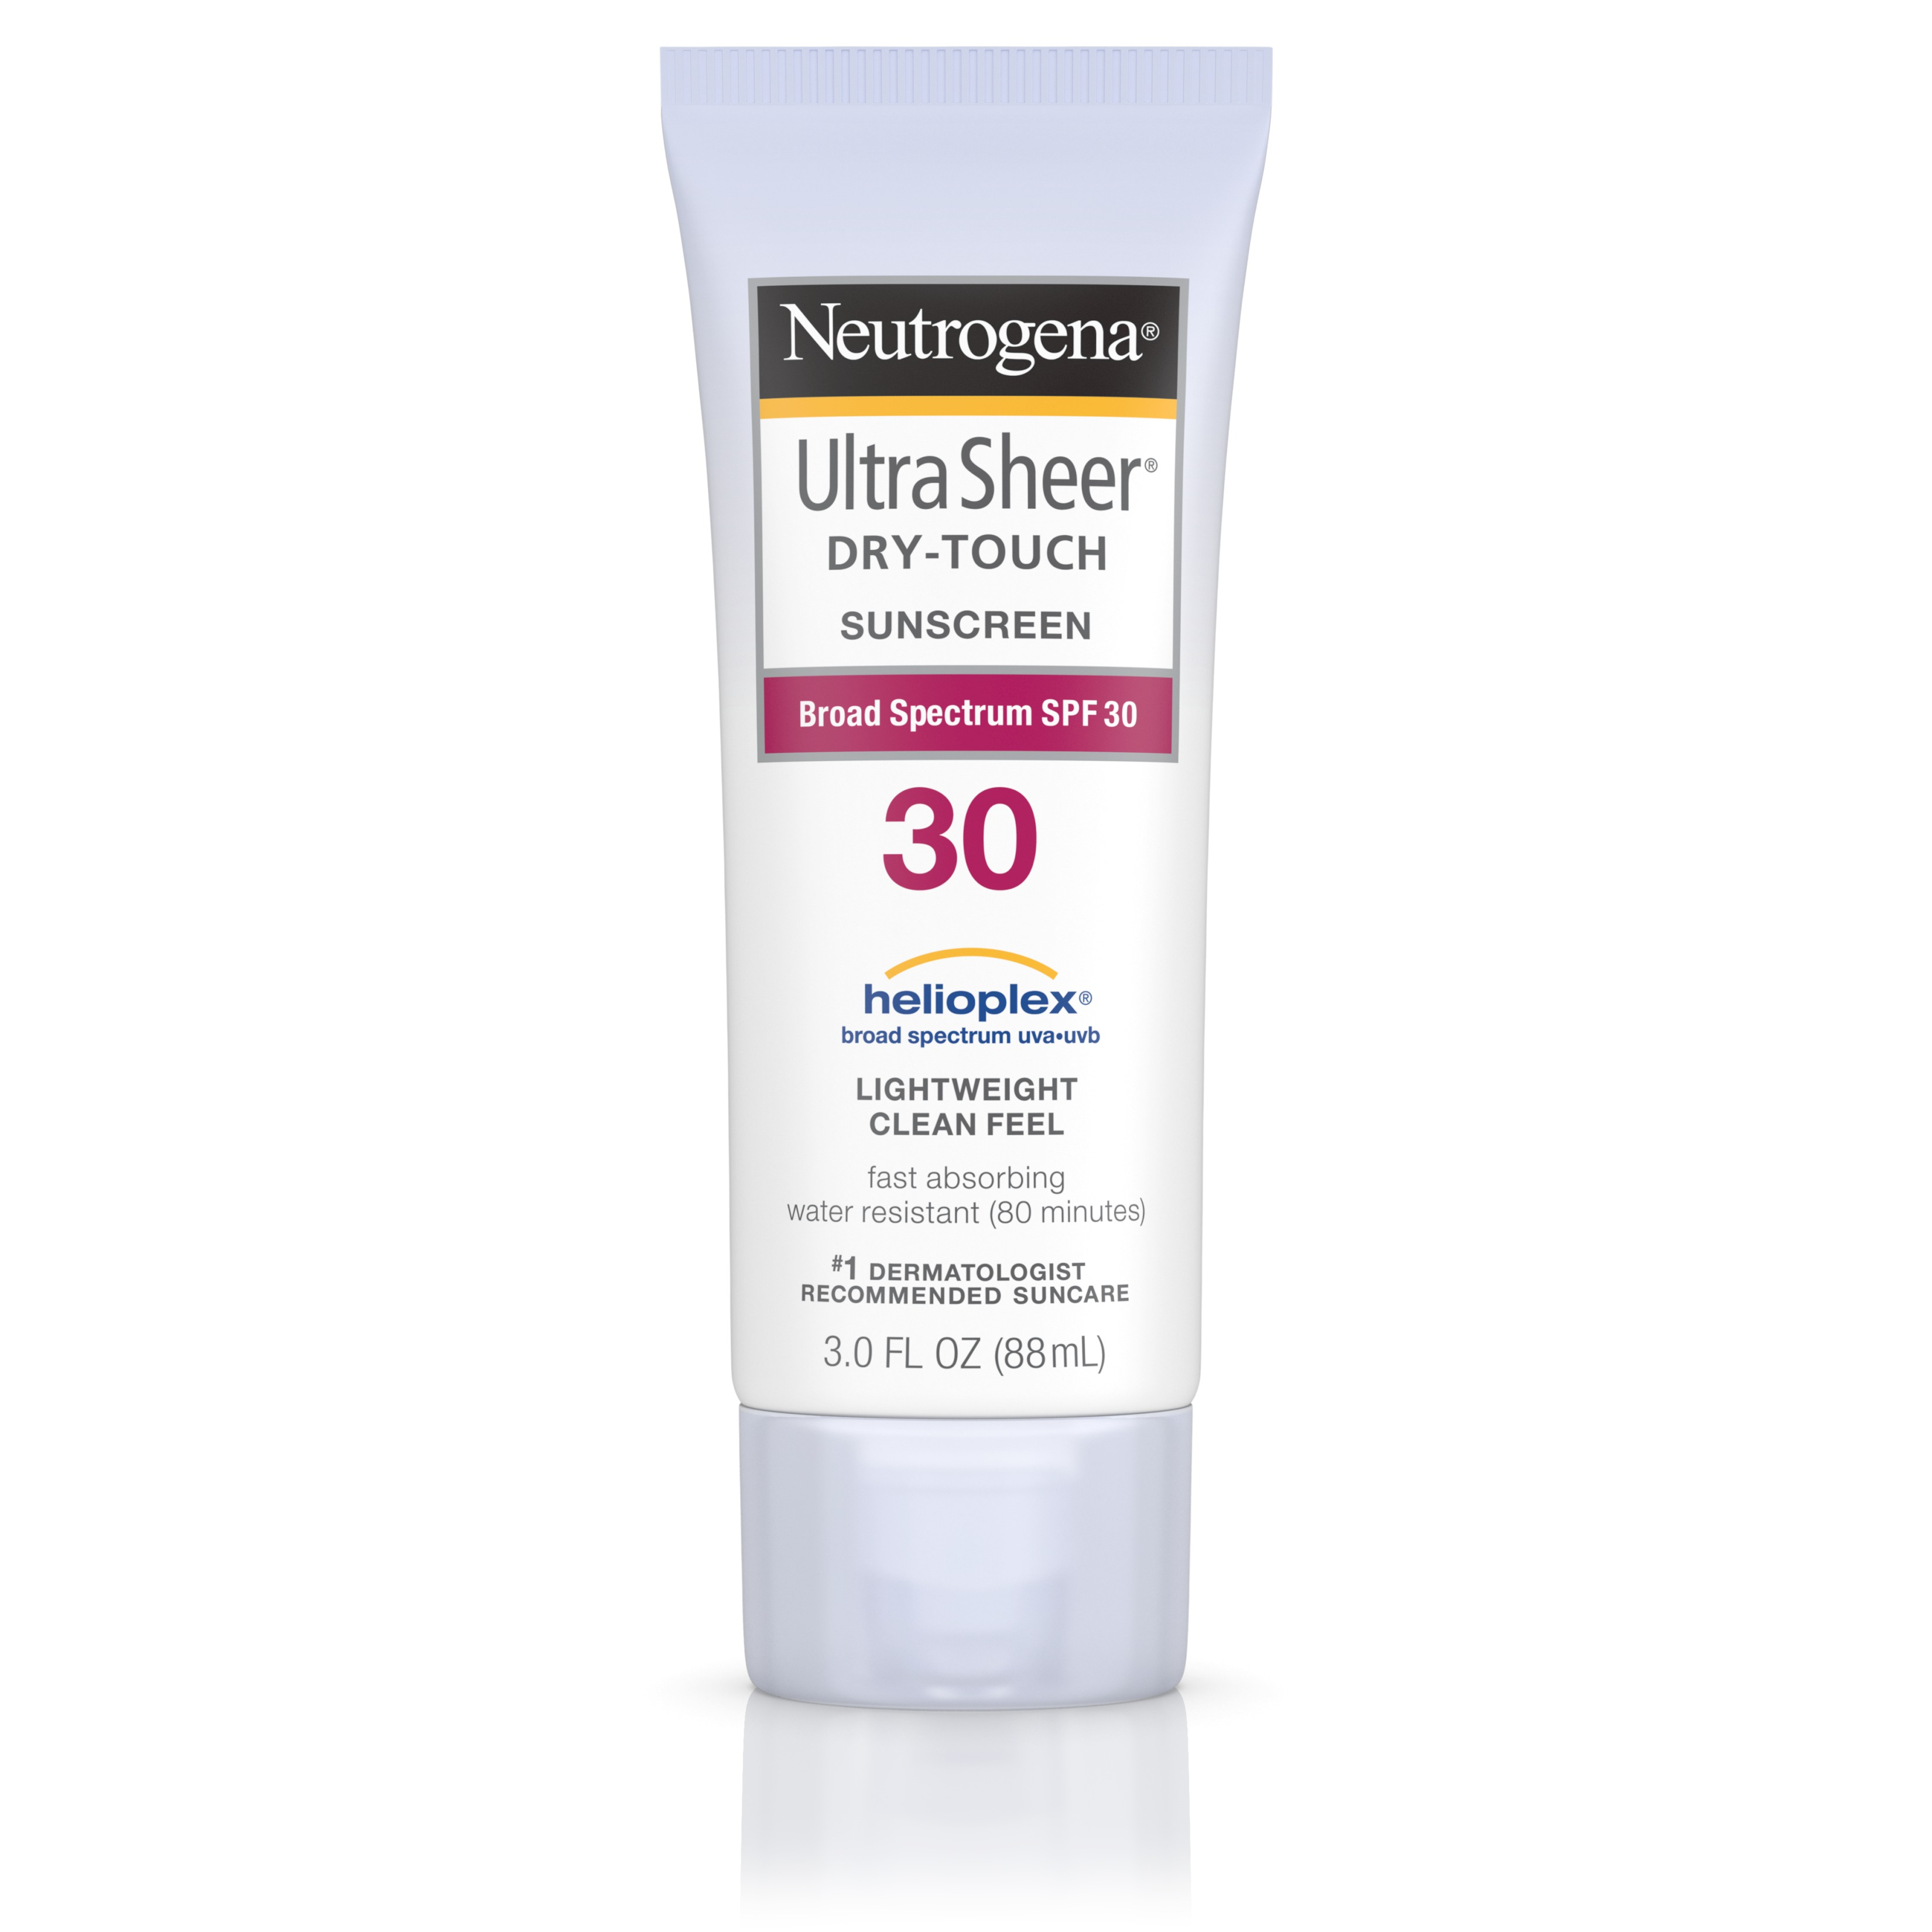 Neutrogena Ultra Sheer Dry-Touch Sunscreen, Broad Spectrum Spf 30, 3 Fl. Oz.